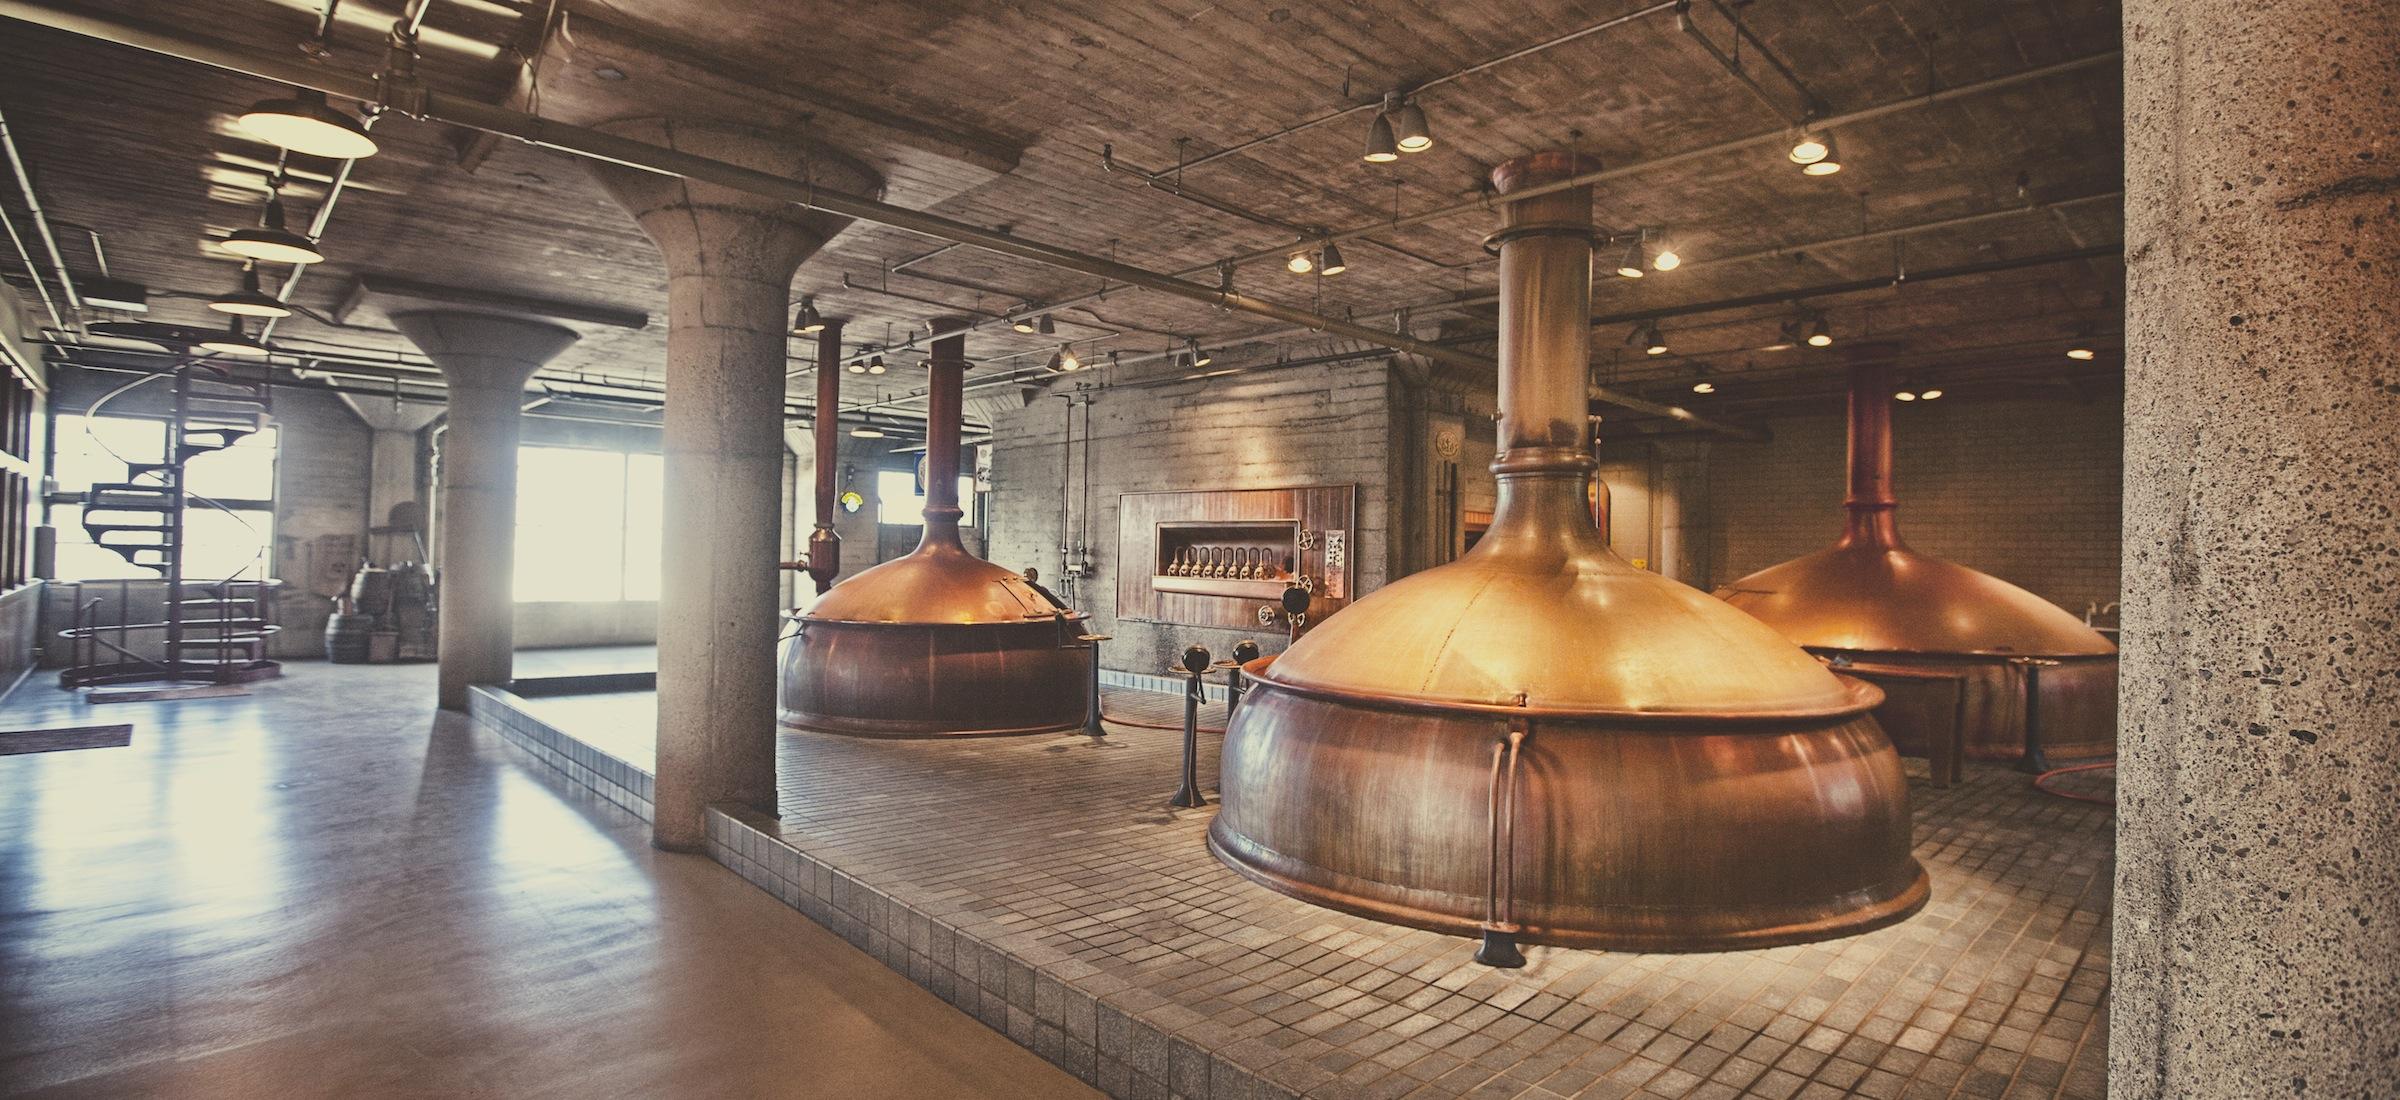 brewhouse+wide_low+res.jpg